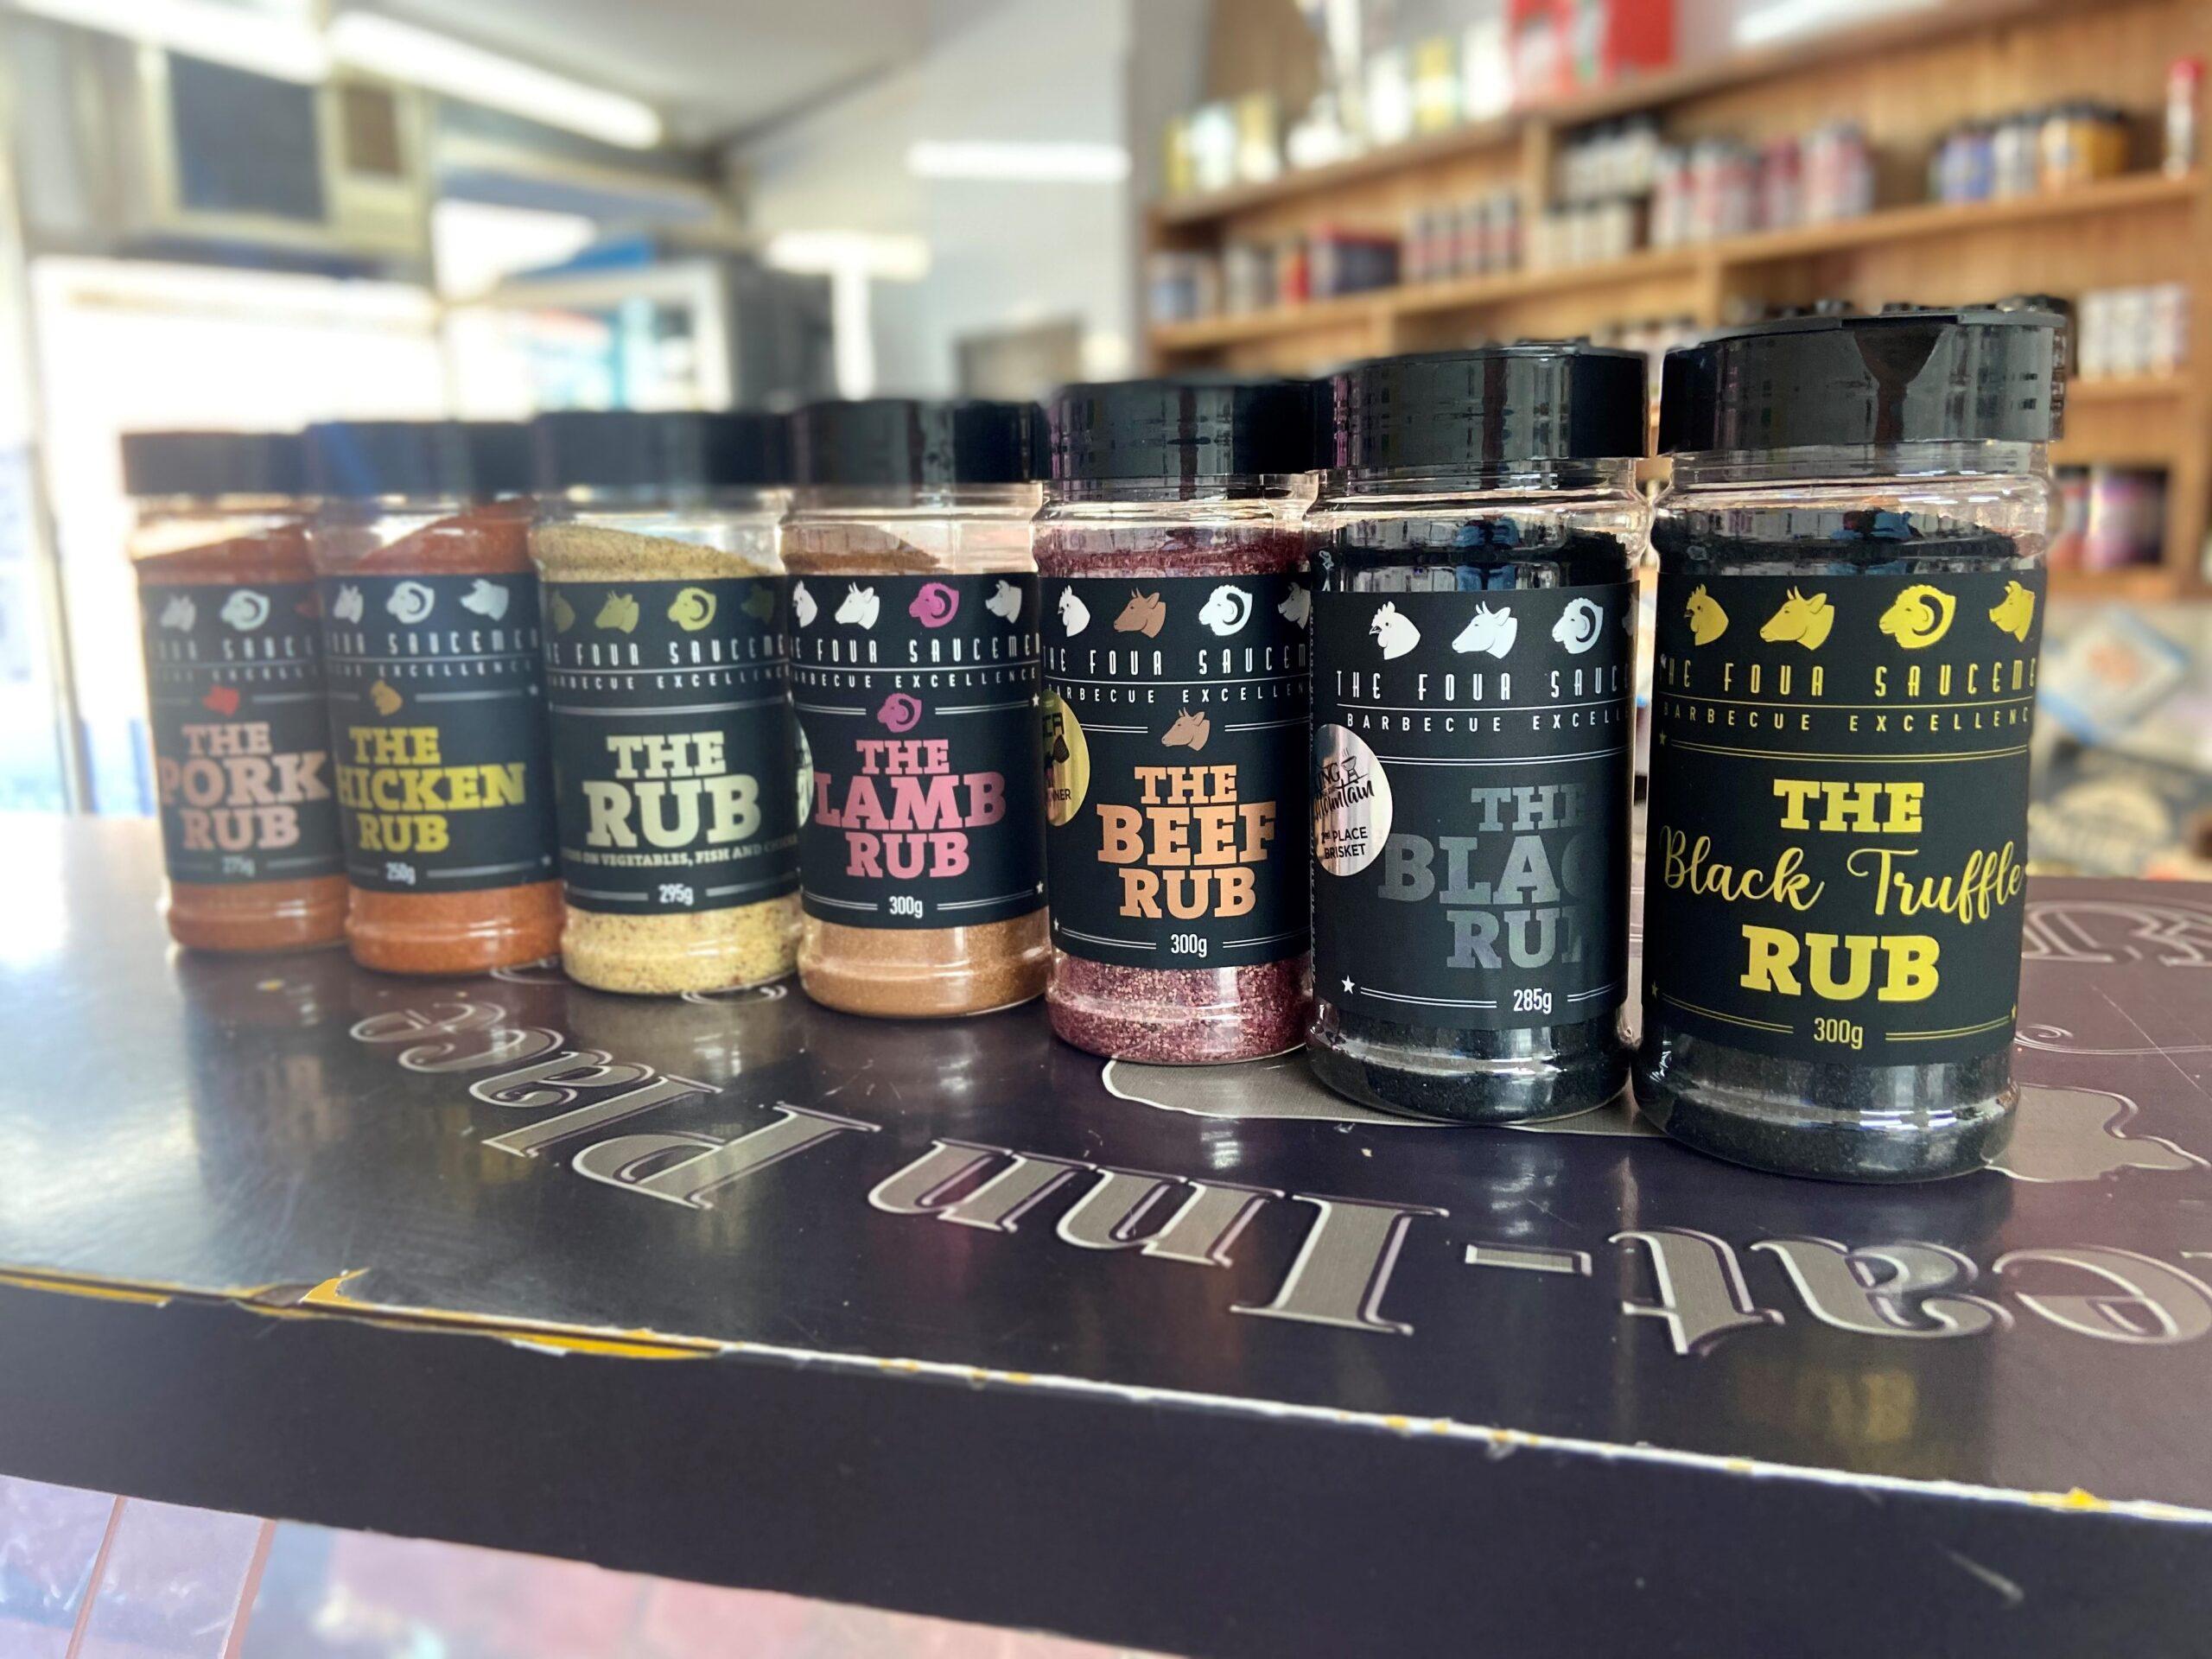 The four saucemen rubs